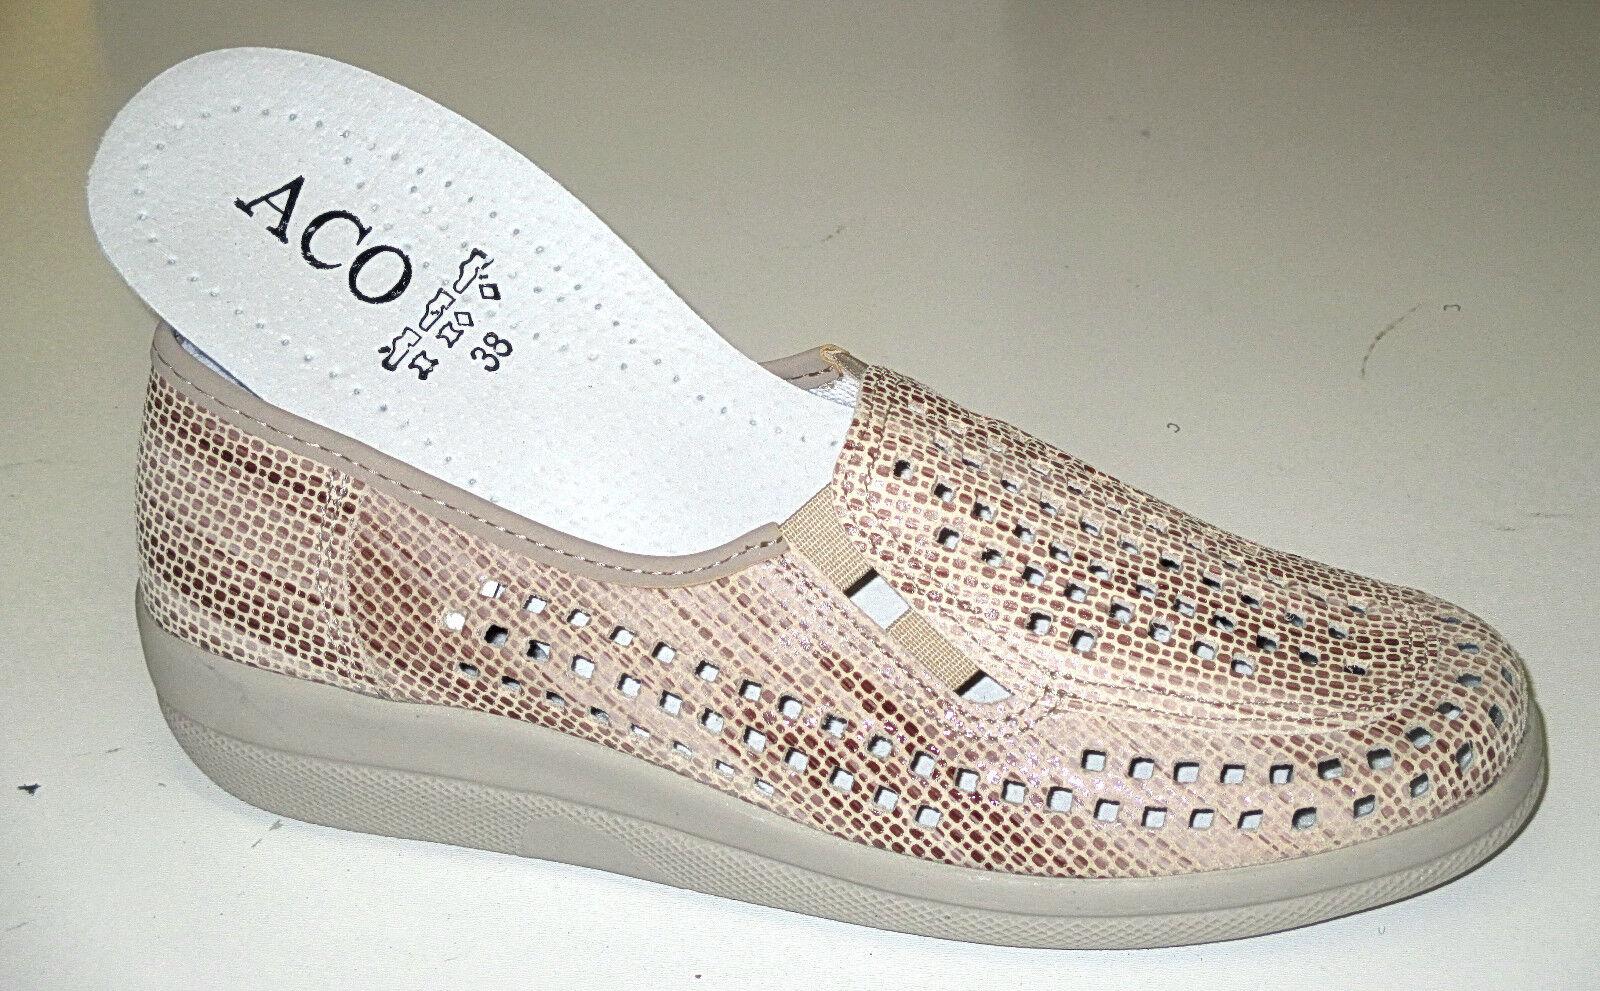 CAV chaussures femmes Pantoufles  Natália , cuir, Taille 35-42 +++ NEUF ++++